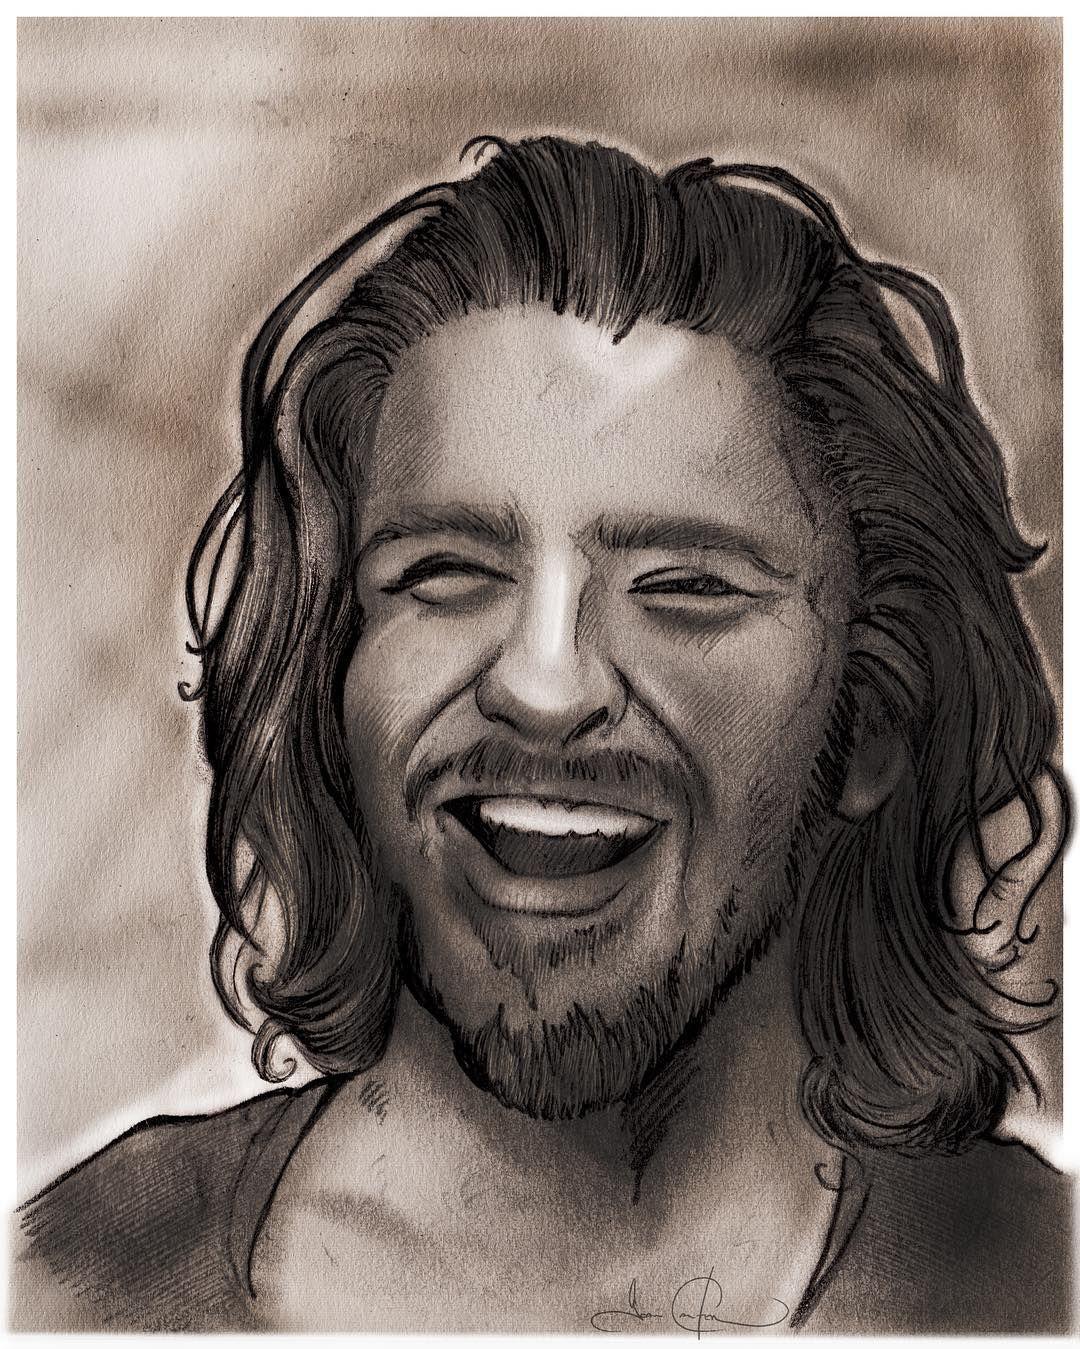 Today's #drawing  u/ Nugget_  Original: http://ift.tt/1s15DRa  http://ift.tt/1Jrzf1w  http://ift.tt/1oBzfCq  http://ift.tt/1Jrzeea  http://ift.tt/1SHwYgv  #digital  #pencil #portrait #reddit #redditgetsdrawn #todayssketch #reddit #art #drawing #portrait #RGD #redditartistnetwork #redditart #redditartist #pencil #art_spotlight #artbotic #artistsdrop #sketch #sketchaday  #love #art #artprint #beautiful #artwork#traditionalart #drawing #traditionaldrawing